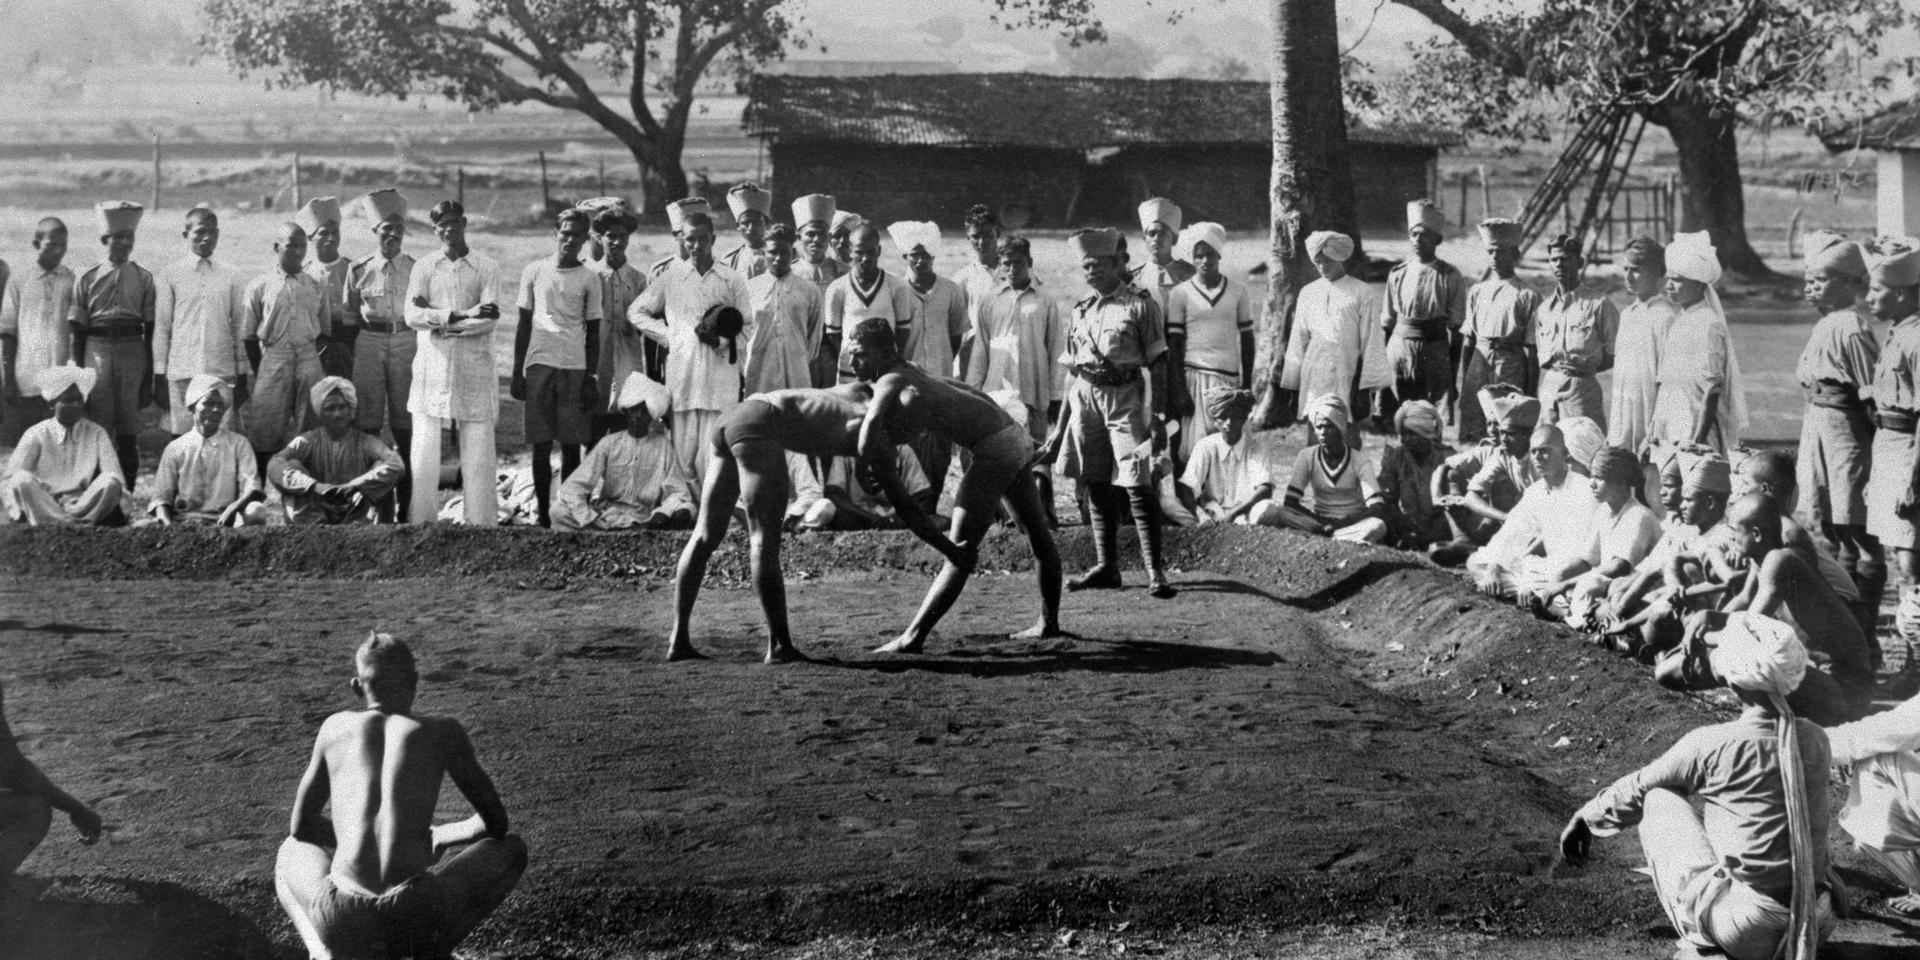 Recruits to the 5th Mahratta Light Infantry wrestling at the Belgaum depot, 1937